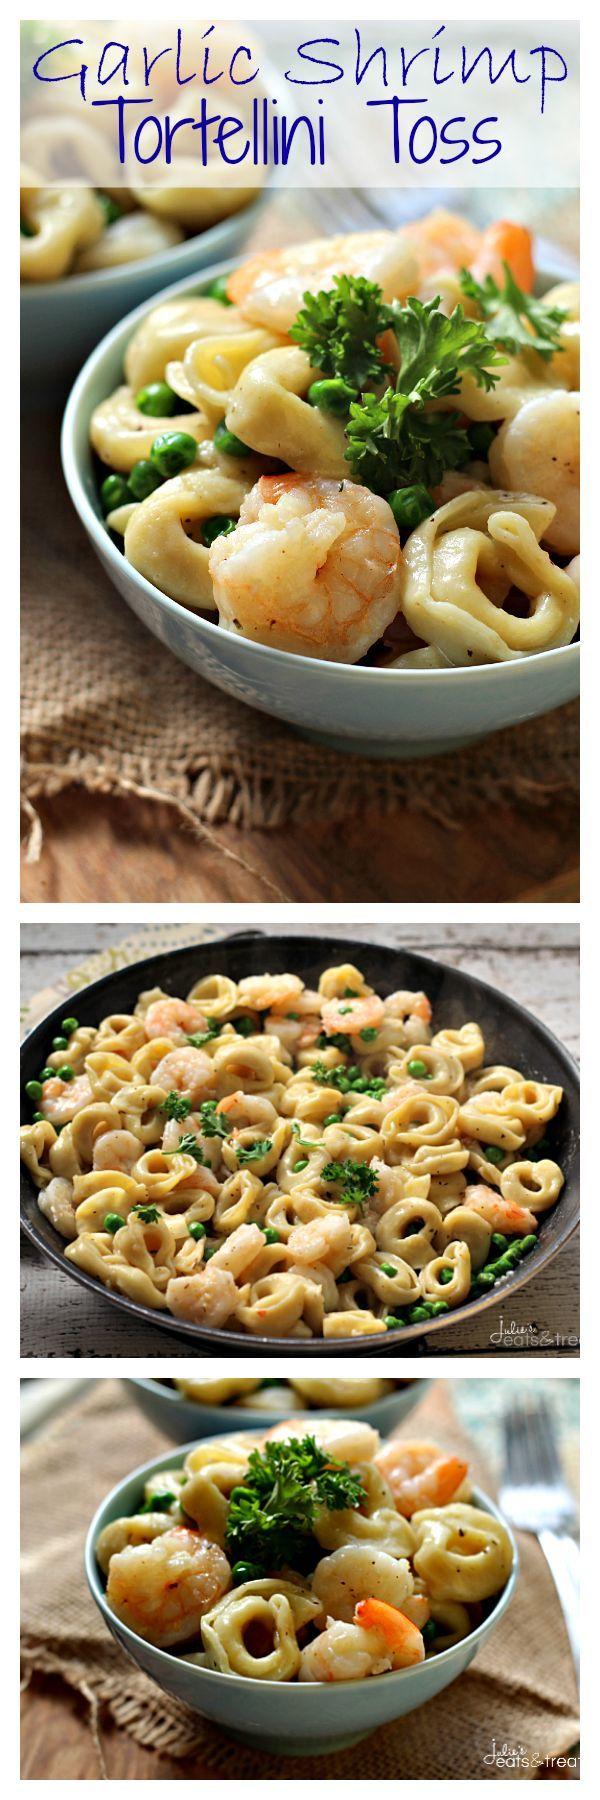 Garlic Shrimp Tortellini Toss